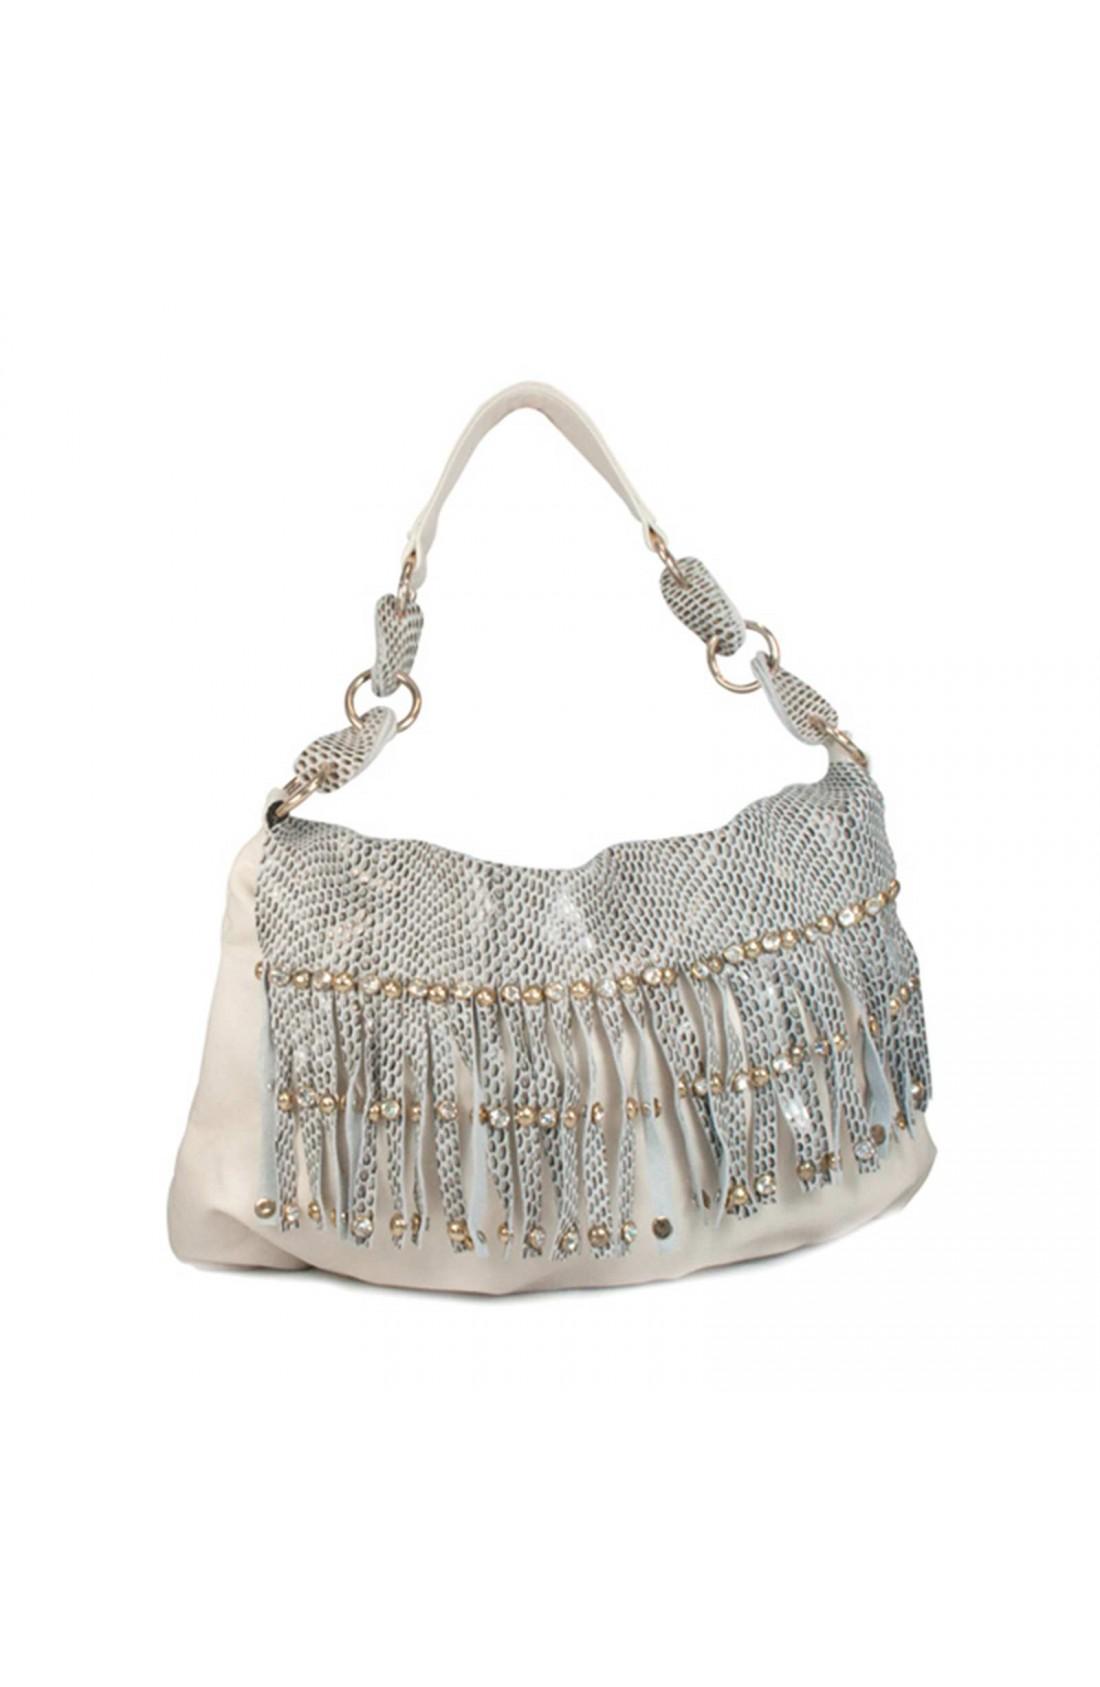 WONDER Cream Leather Handbag with Diamante and Studded Tassels